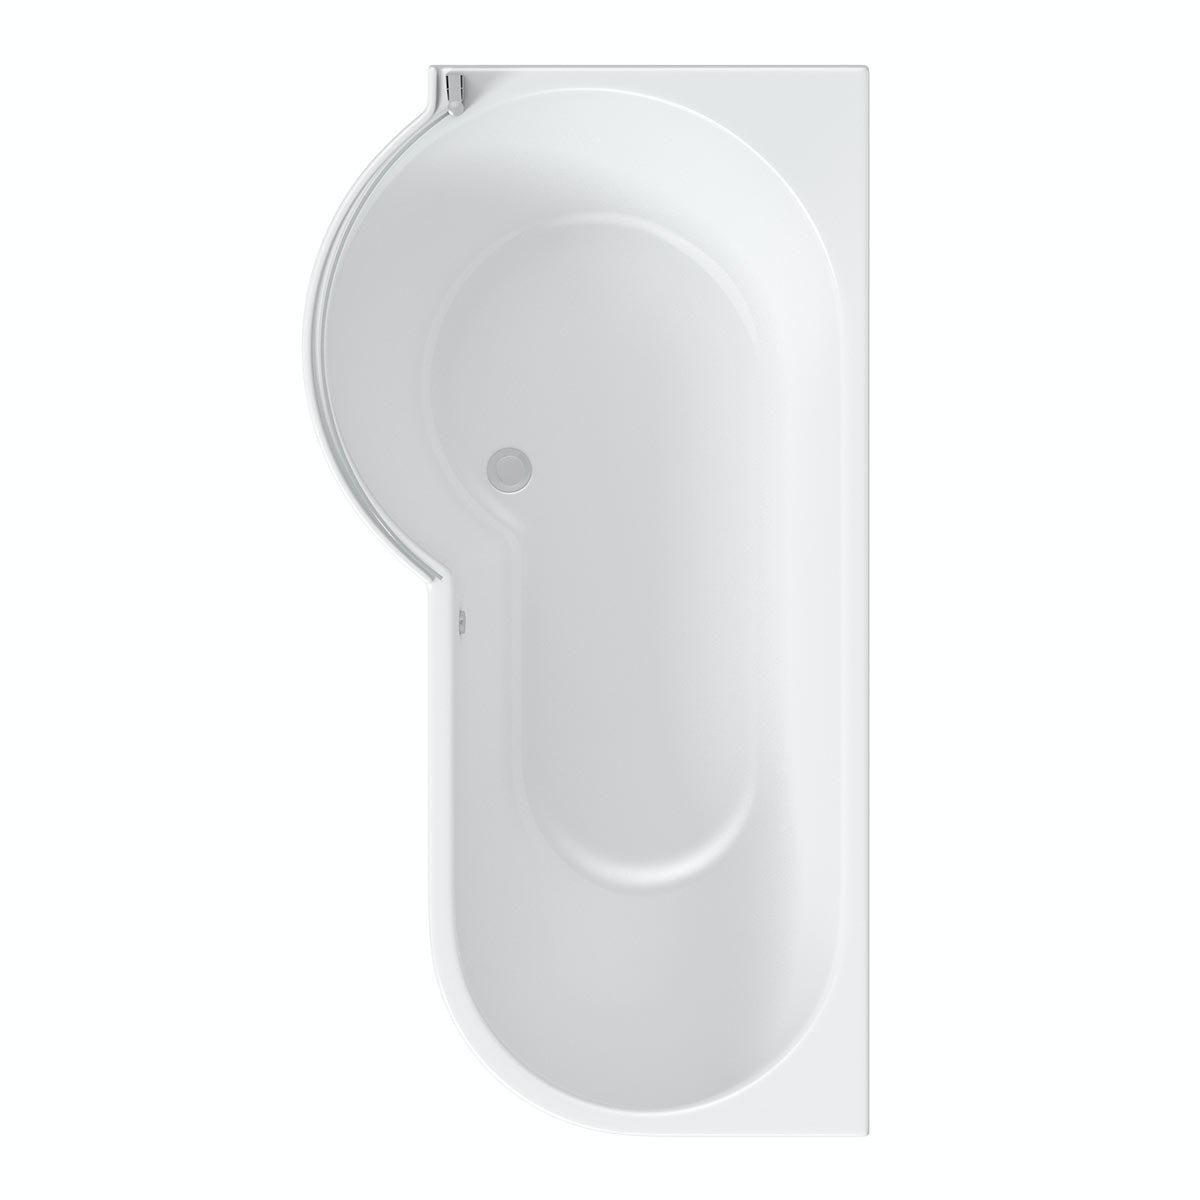 mode maine left handed p shaped shower bath and shower p shaped bath 1500mm 1700mm bath full enclosure screen